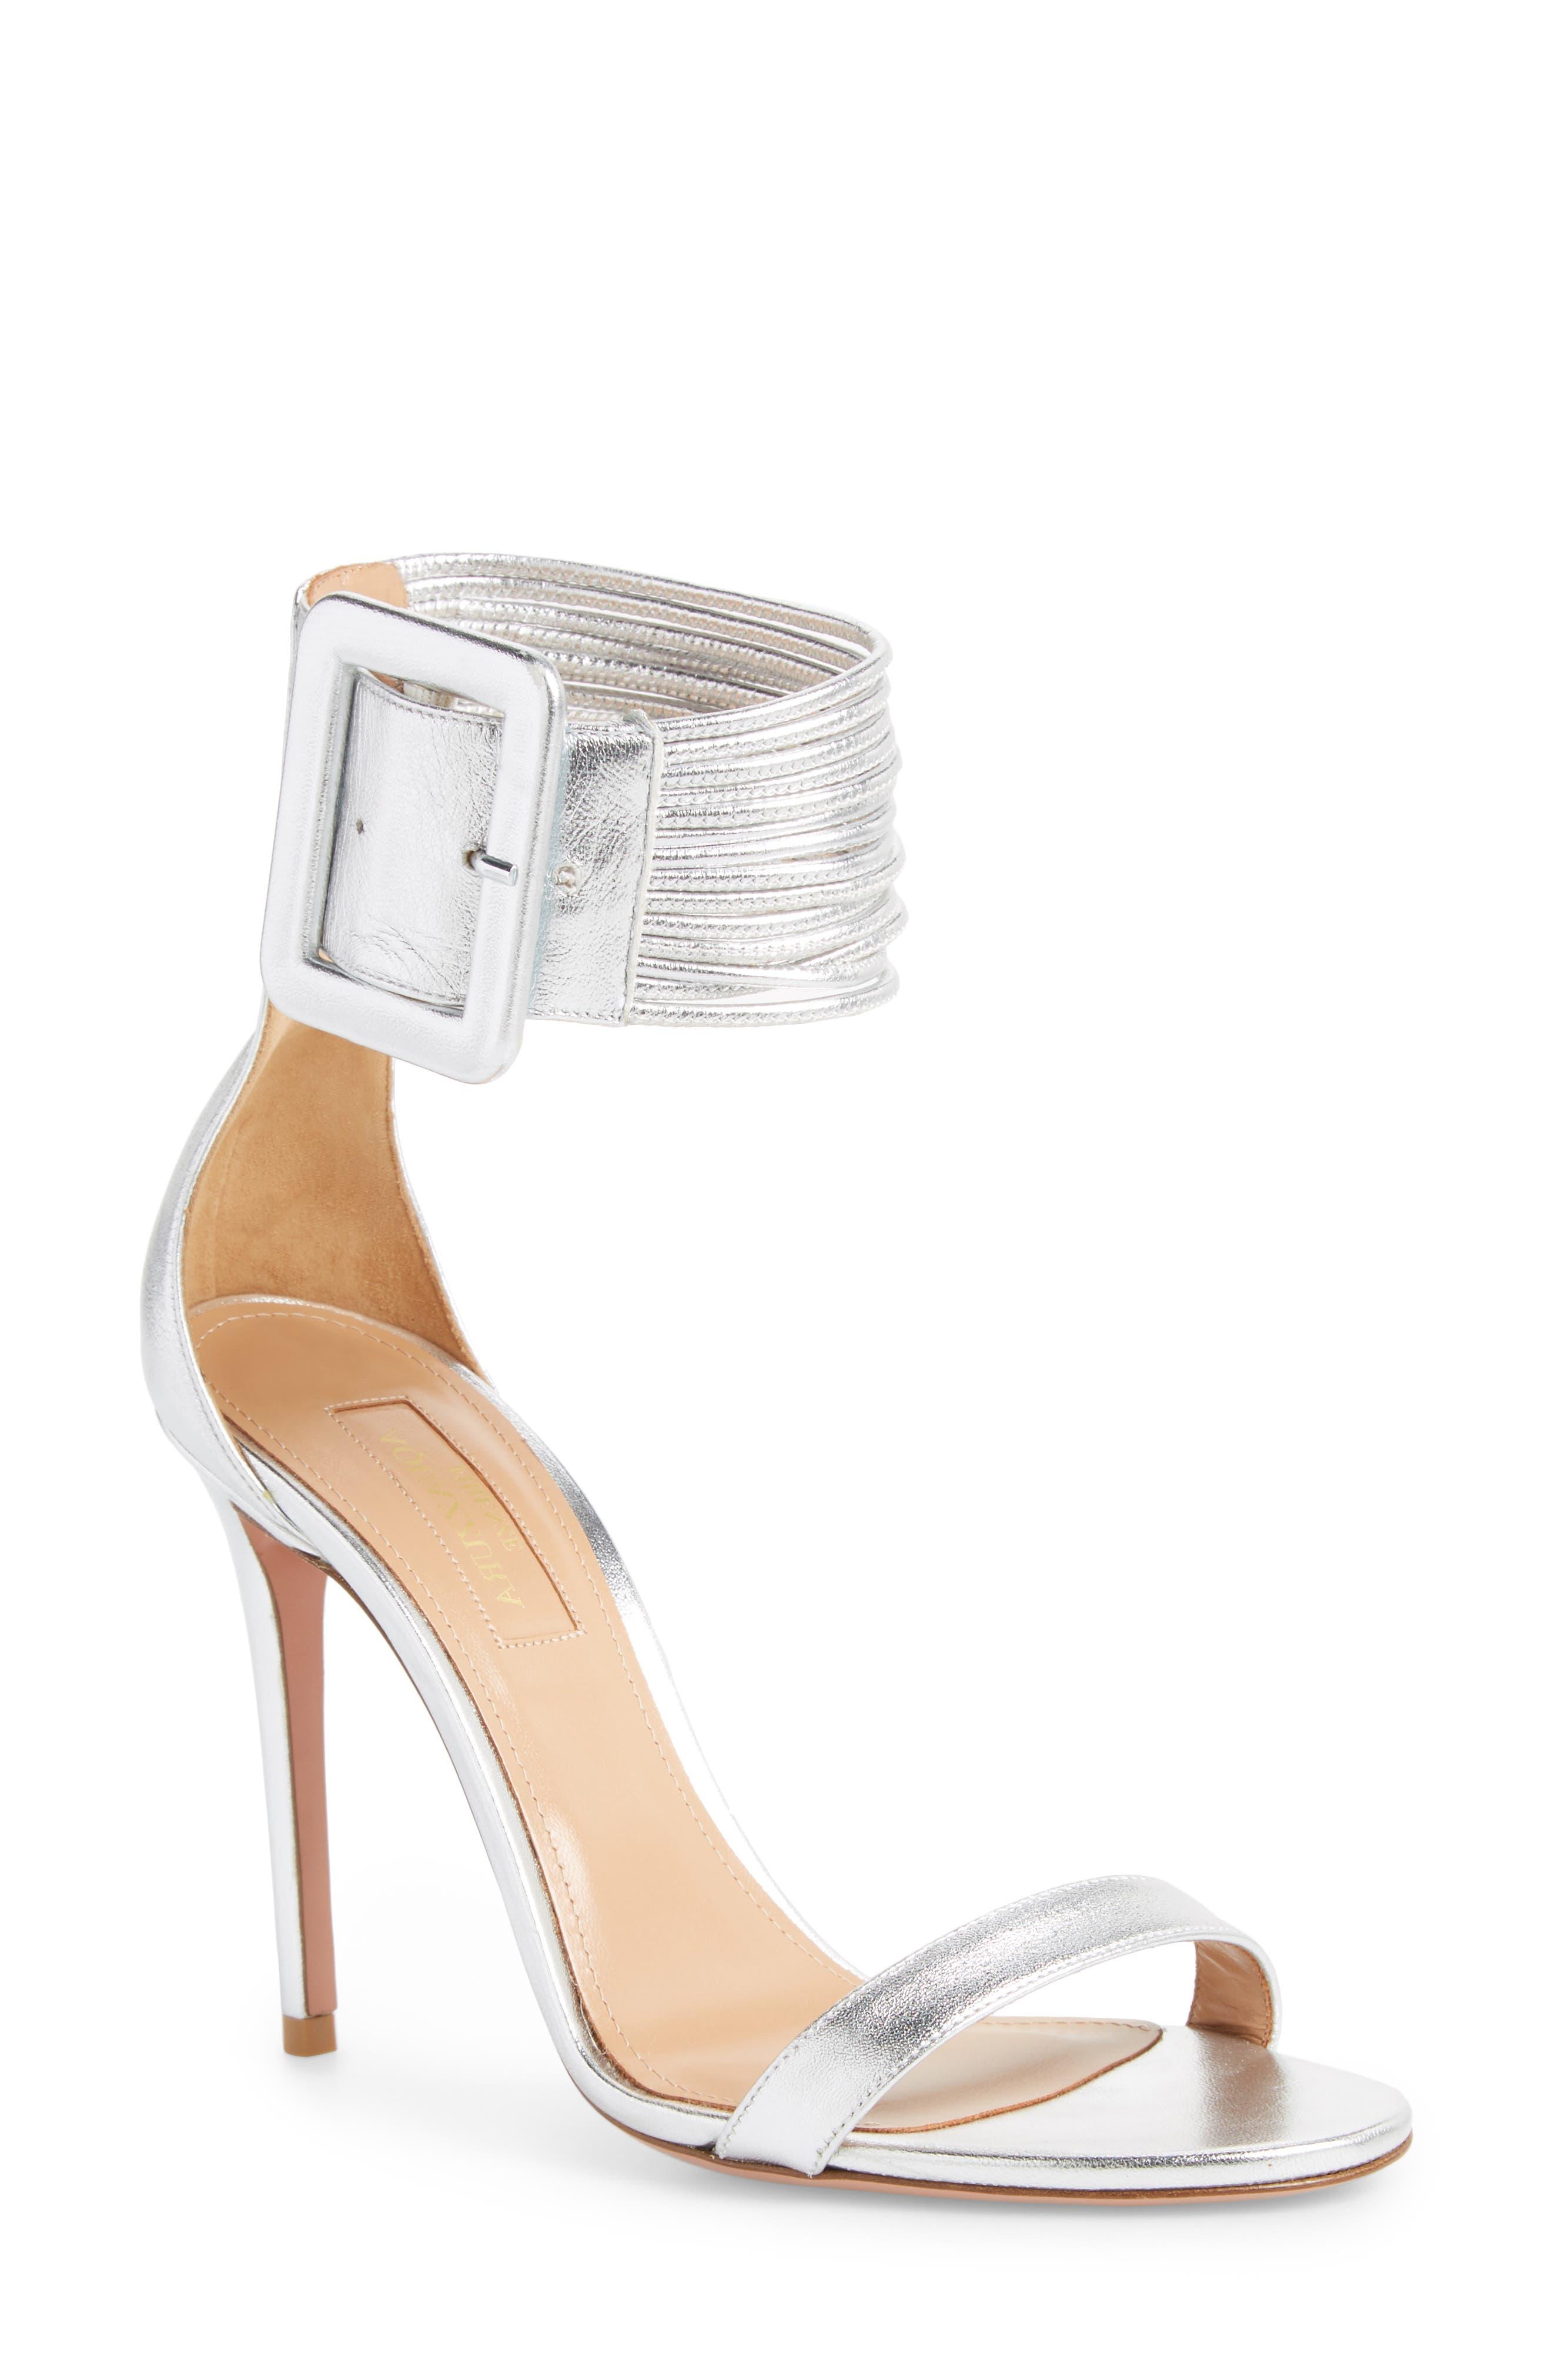 Casablanca Ankle Cuff Sandal,                         Main,                         color, 040